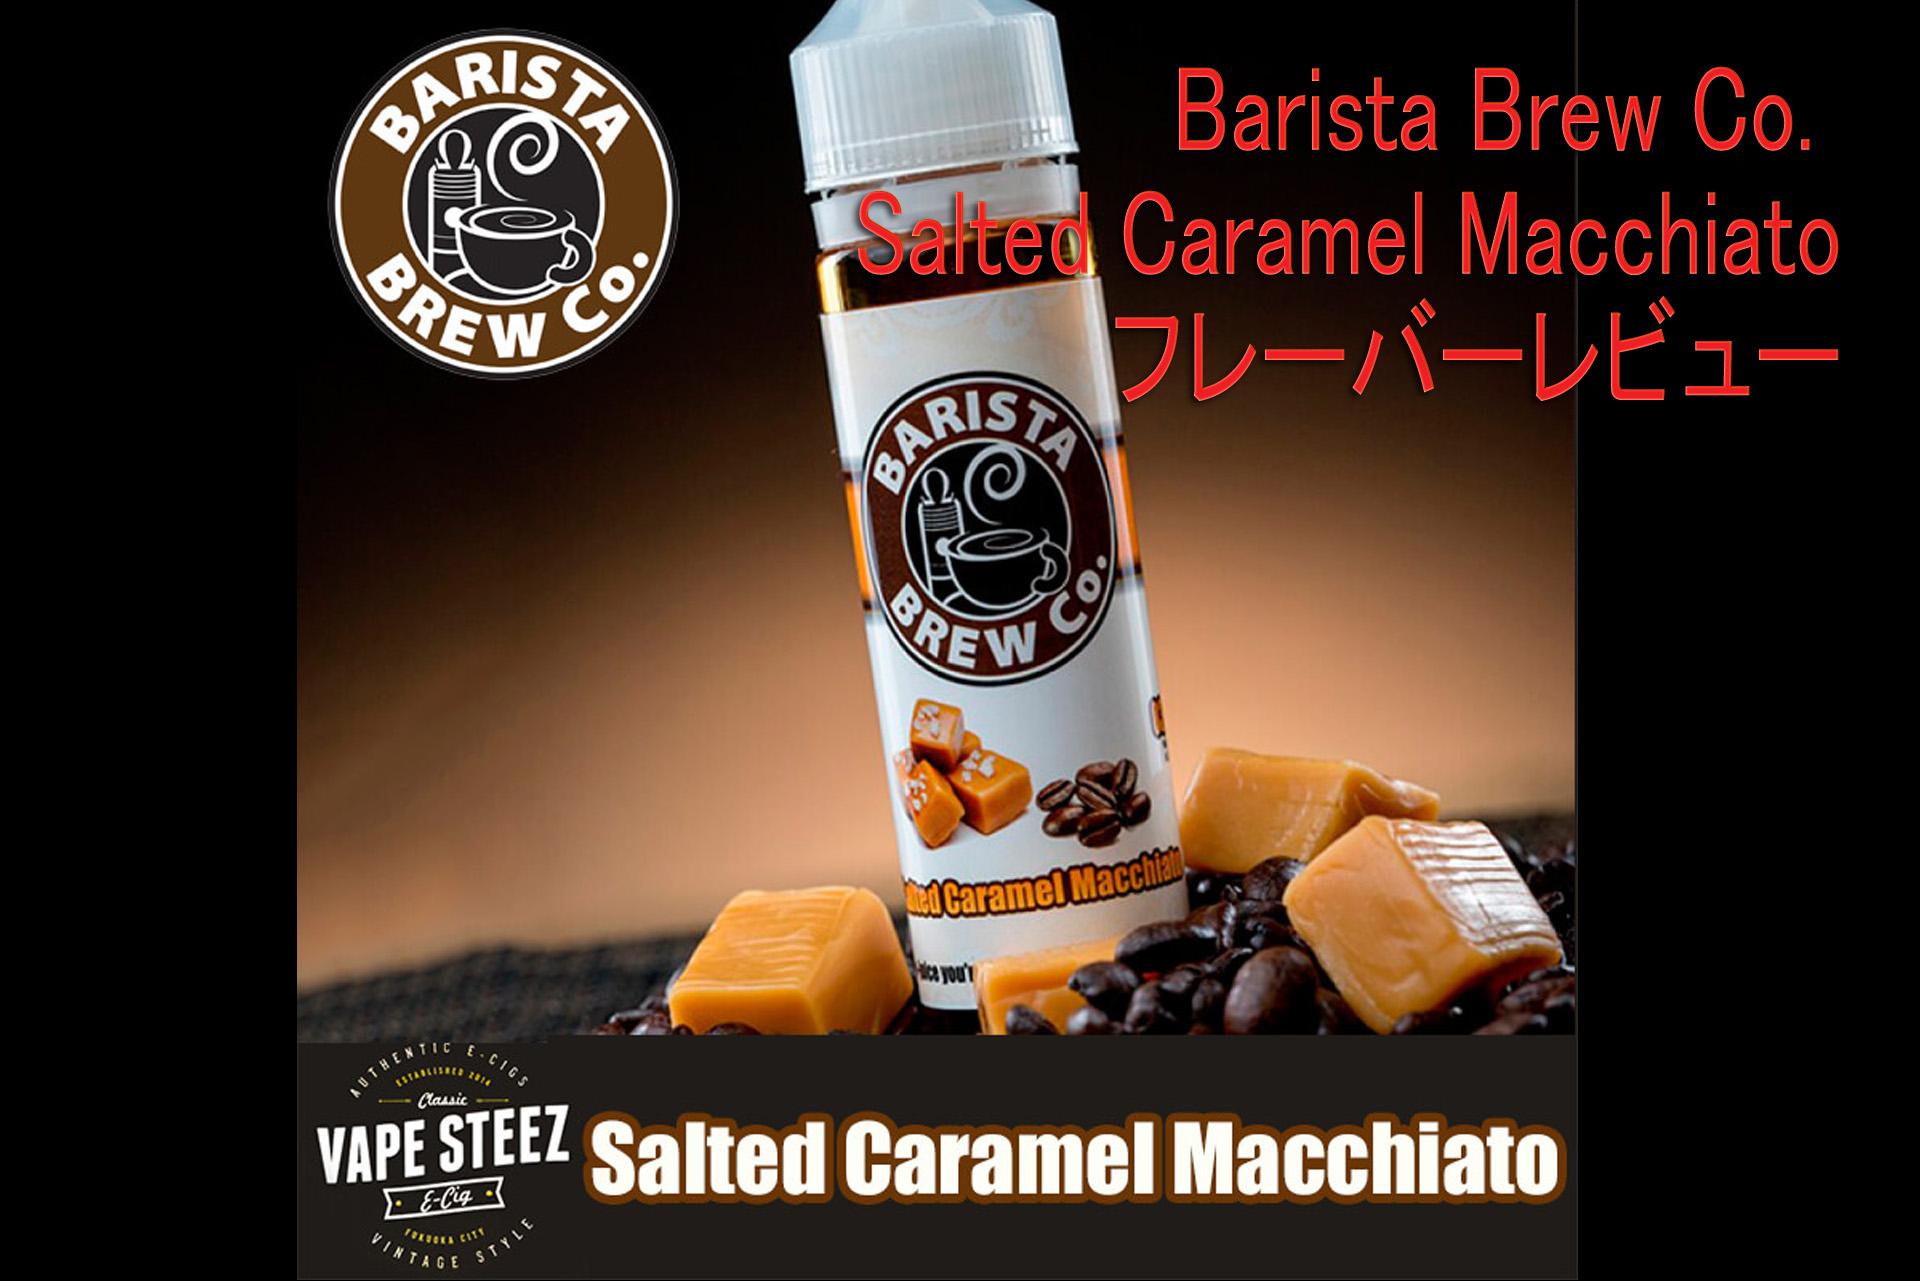 Barista Brew Co. Salted Caramel Macchiatoフレーバーレビュー